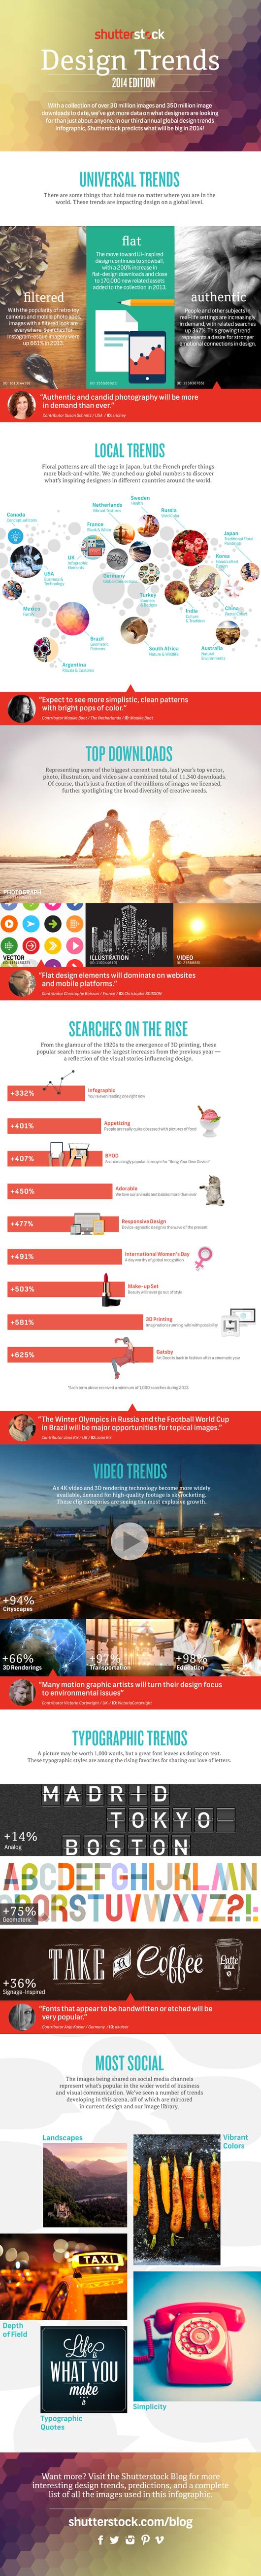 shutterstock_infographic_design_trends_2014.jpg